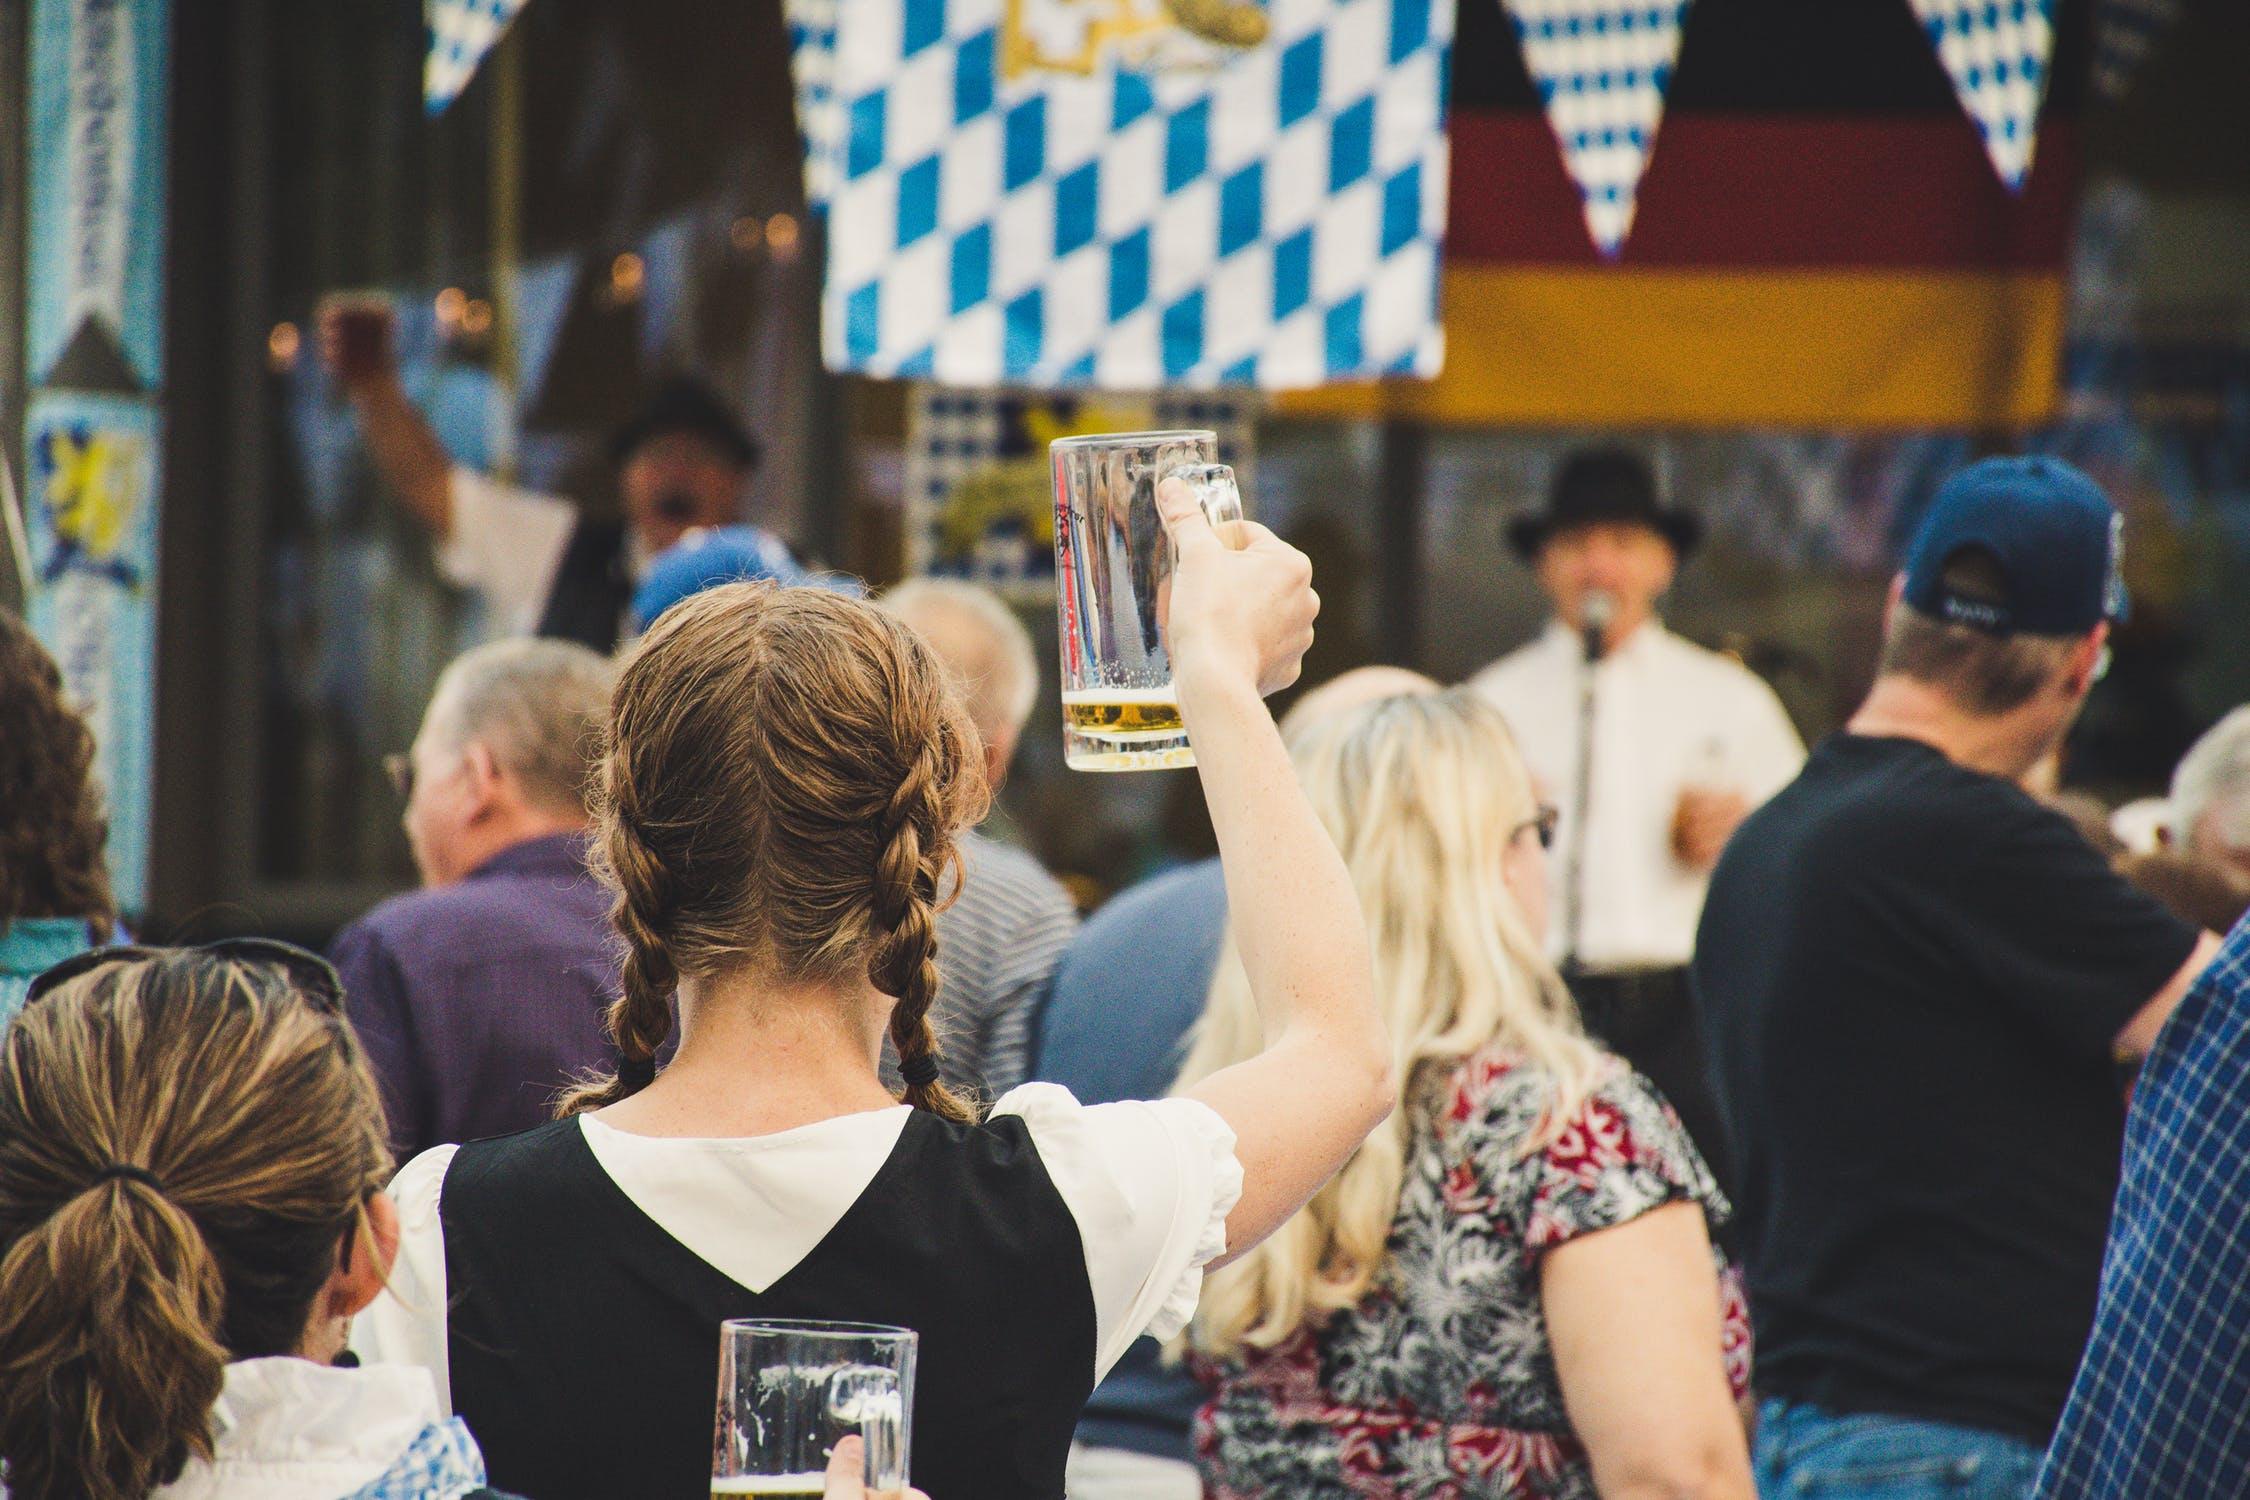 oktoberfest-girl-braids-beer-band